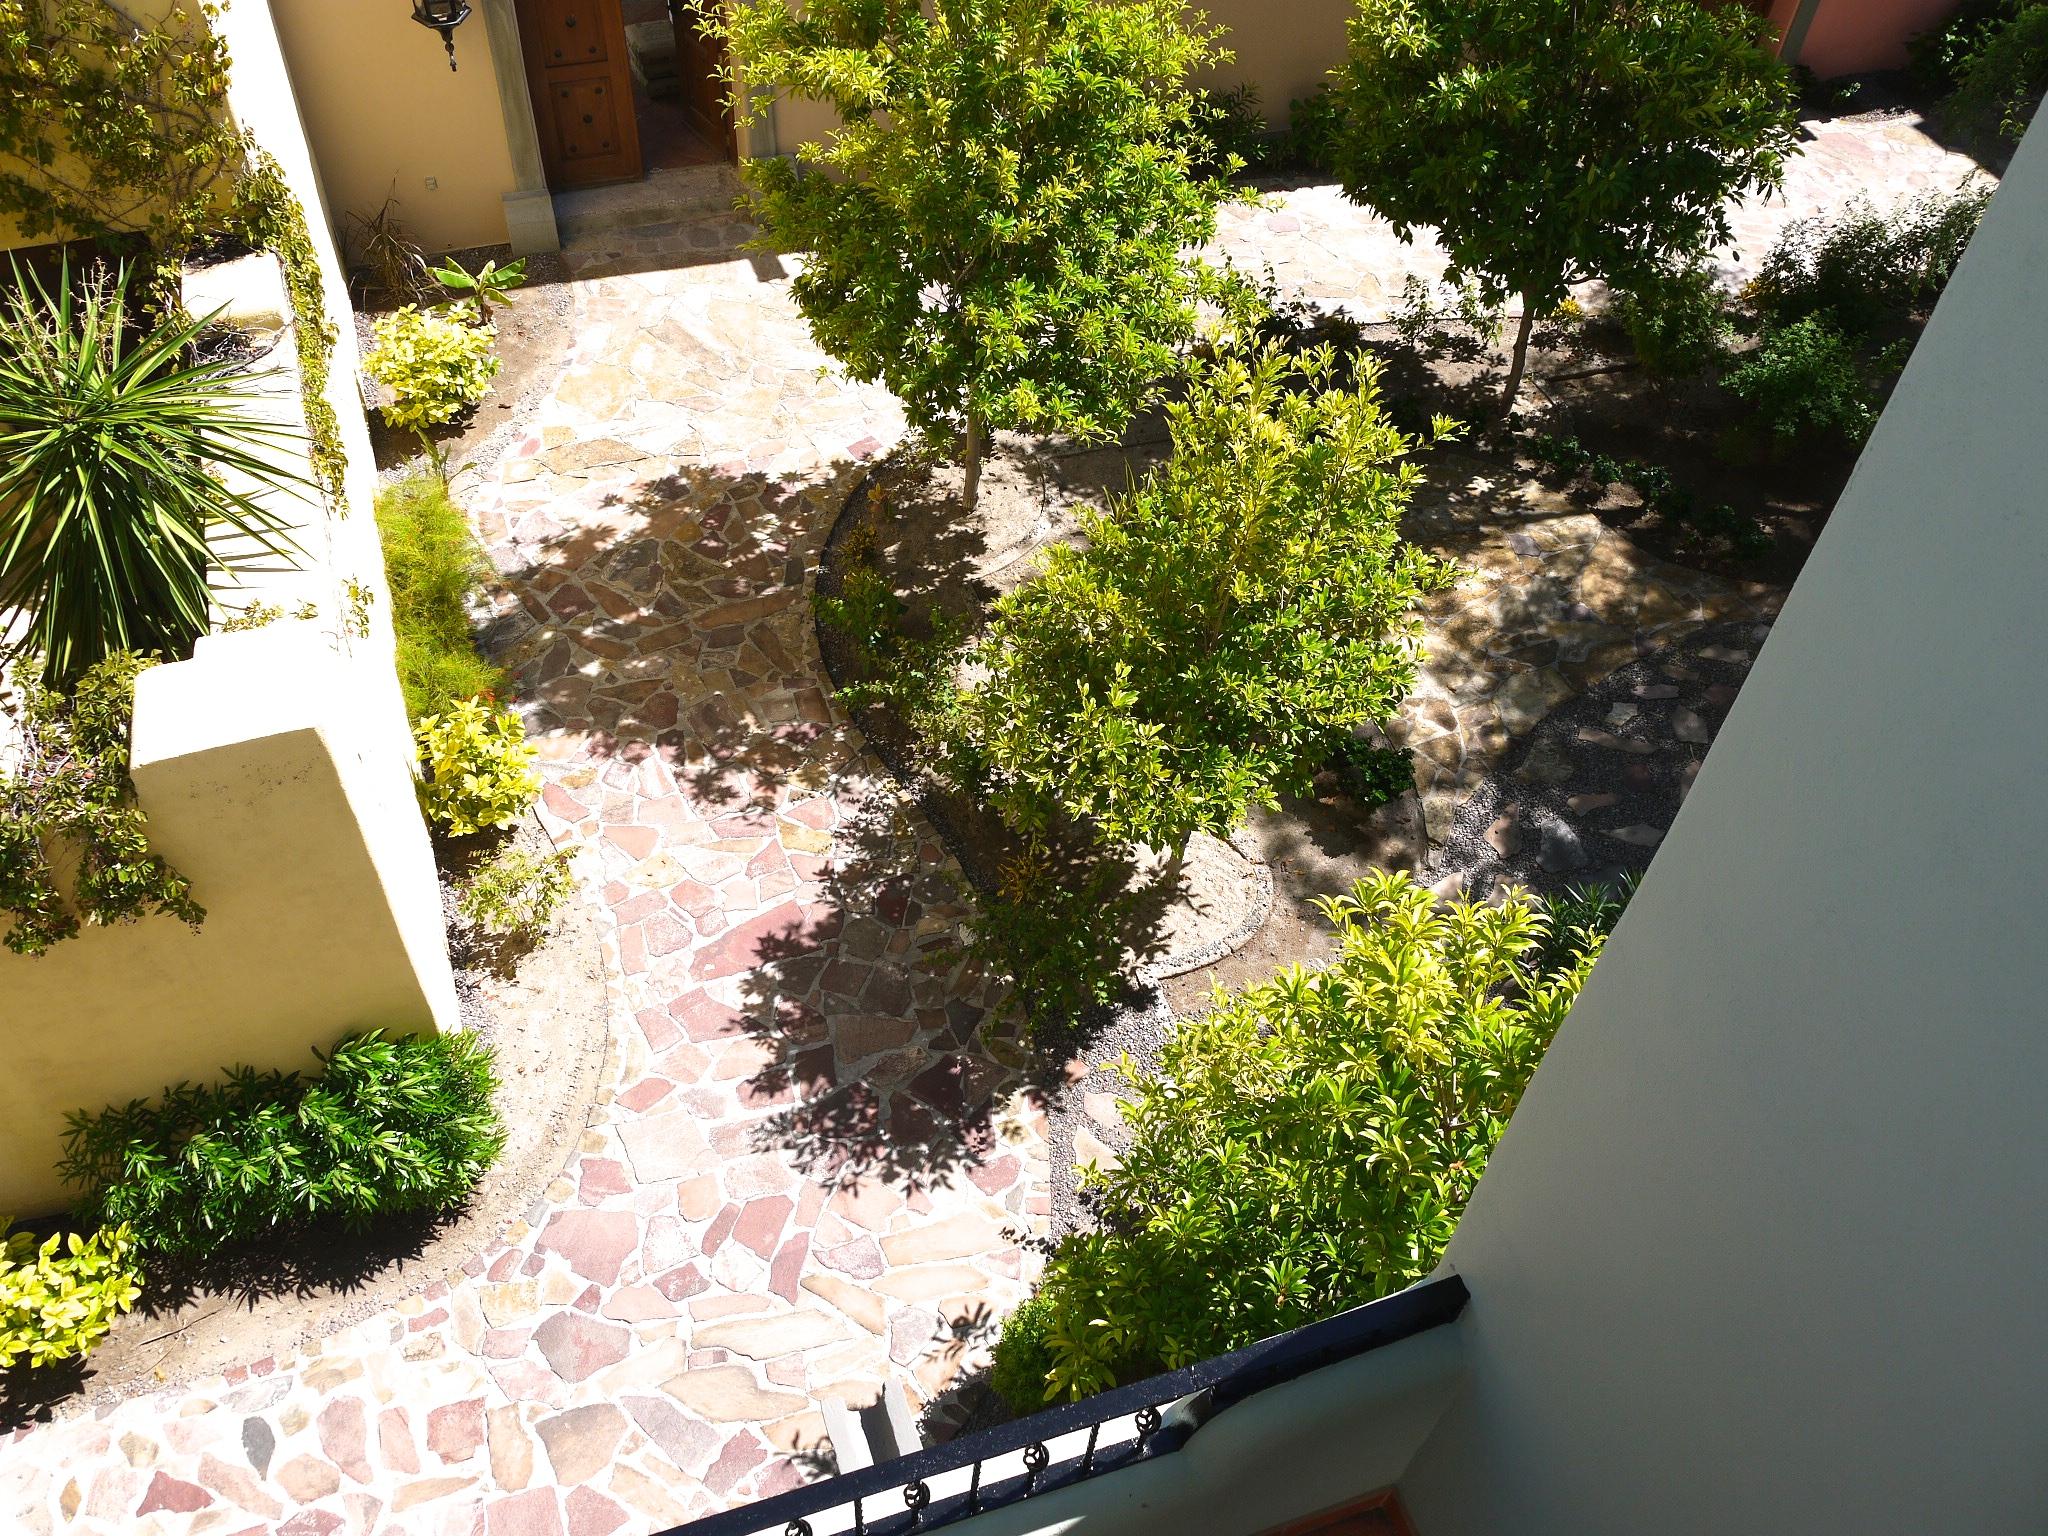 Garden courtyard behind Casa Buena Vista, shared with neighbors